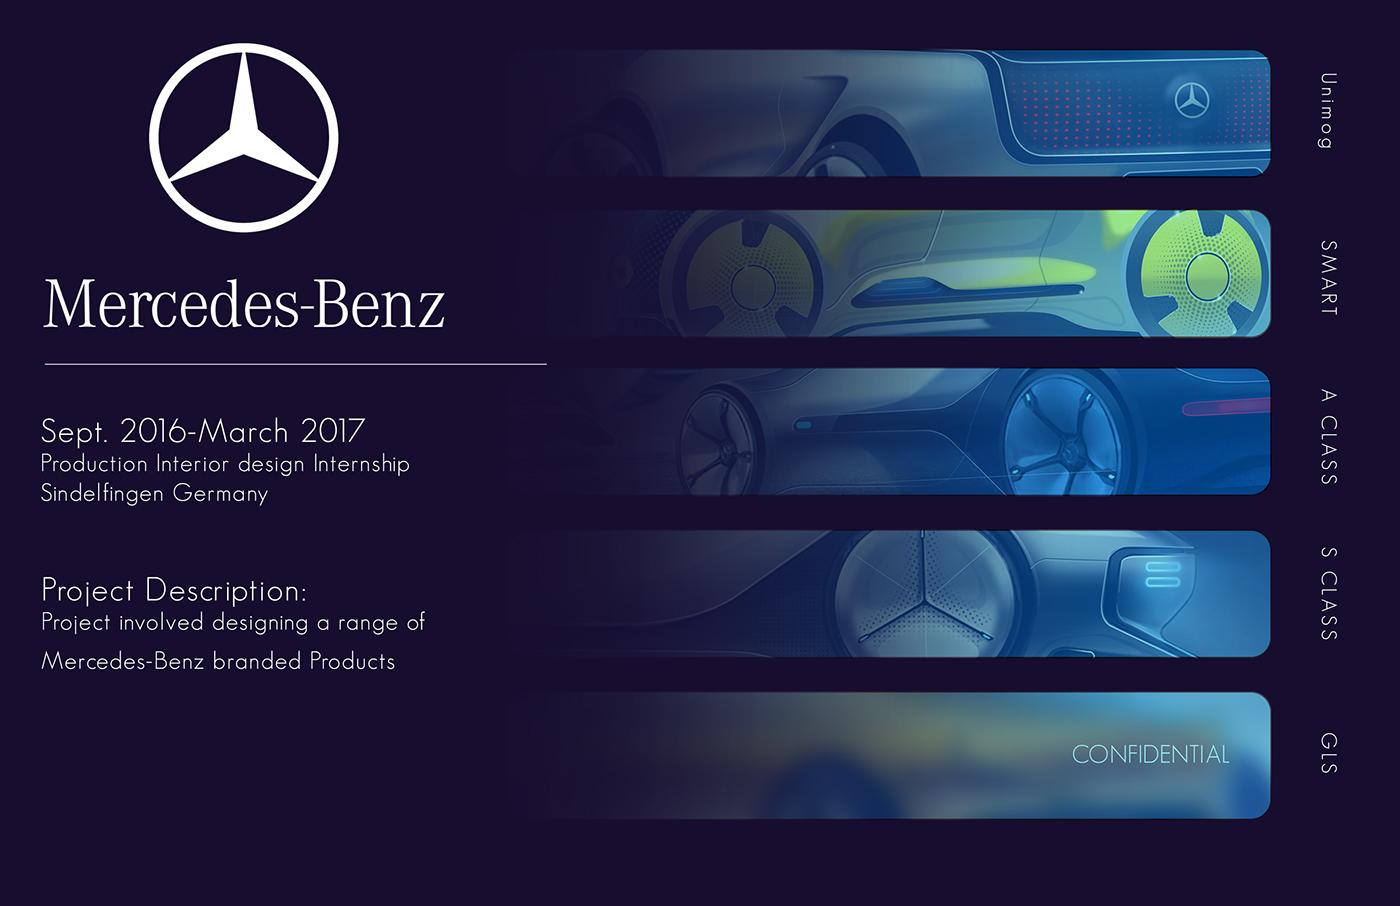 MercedesBenz Internship 2016 on Behance